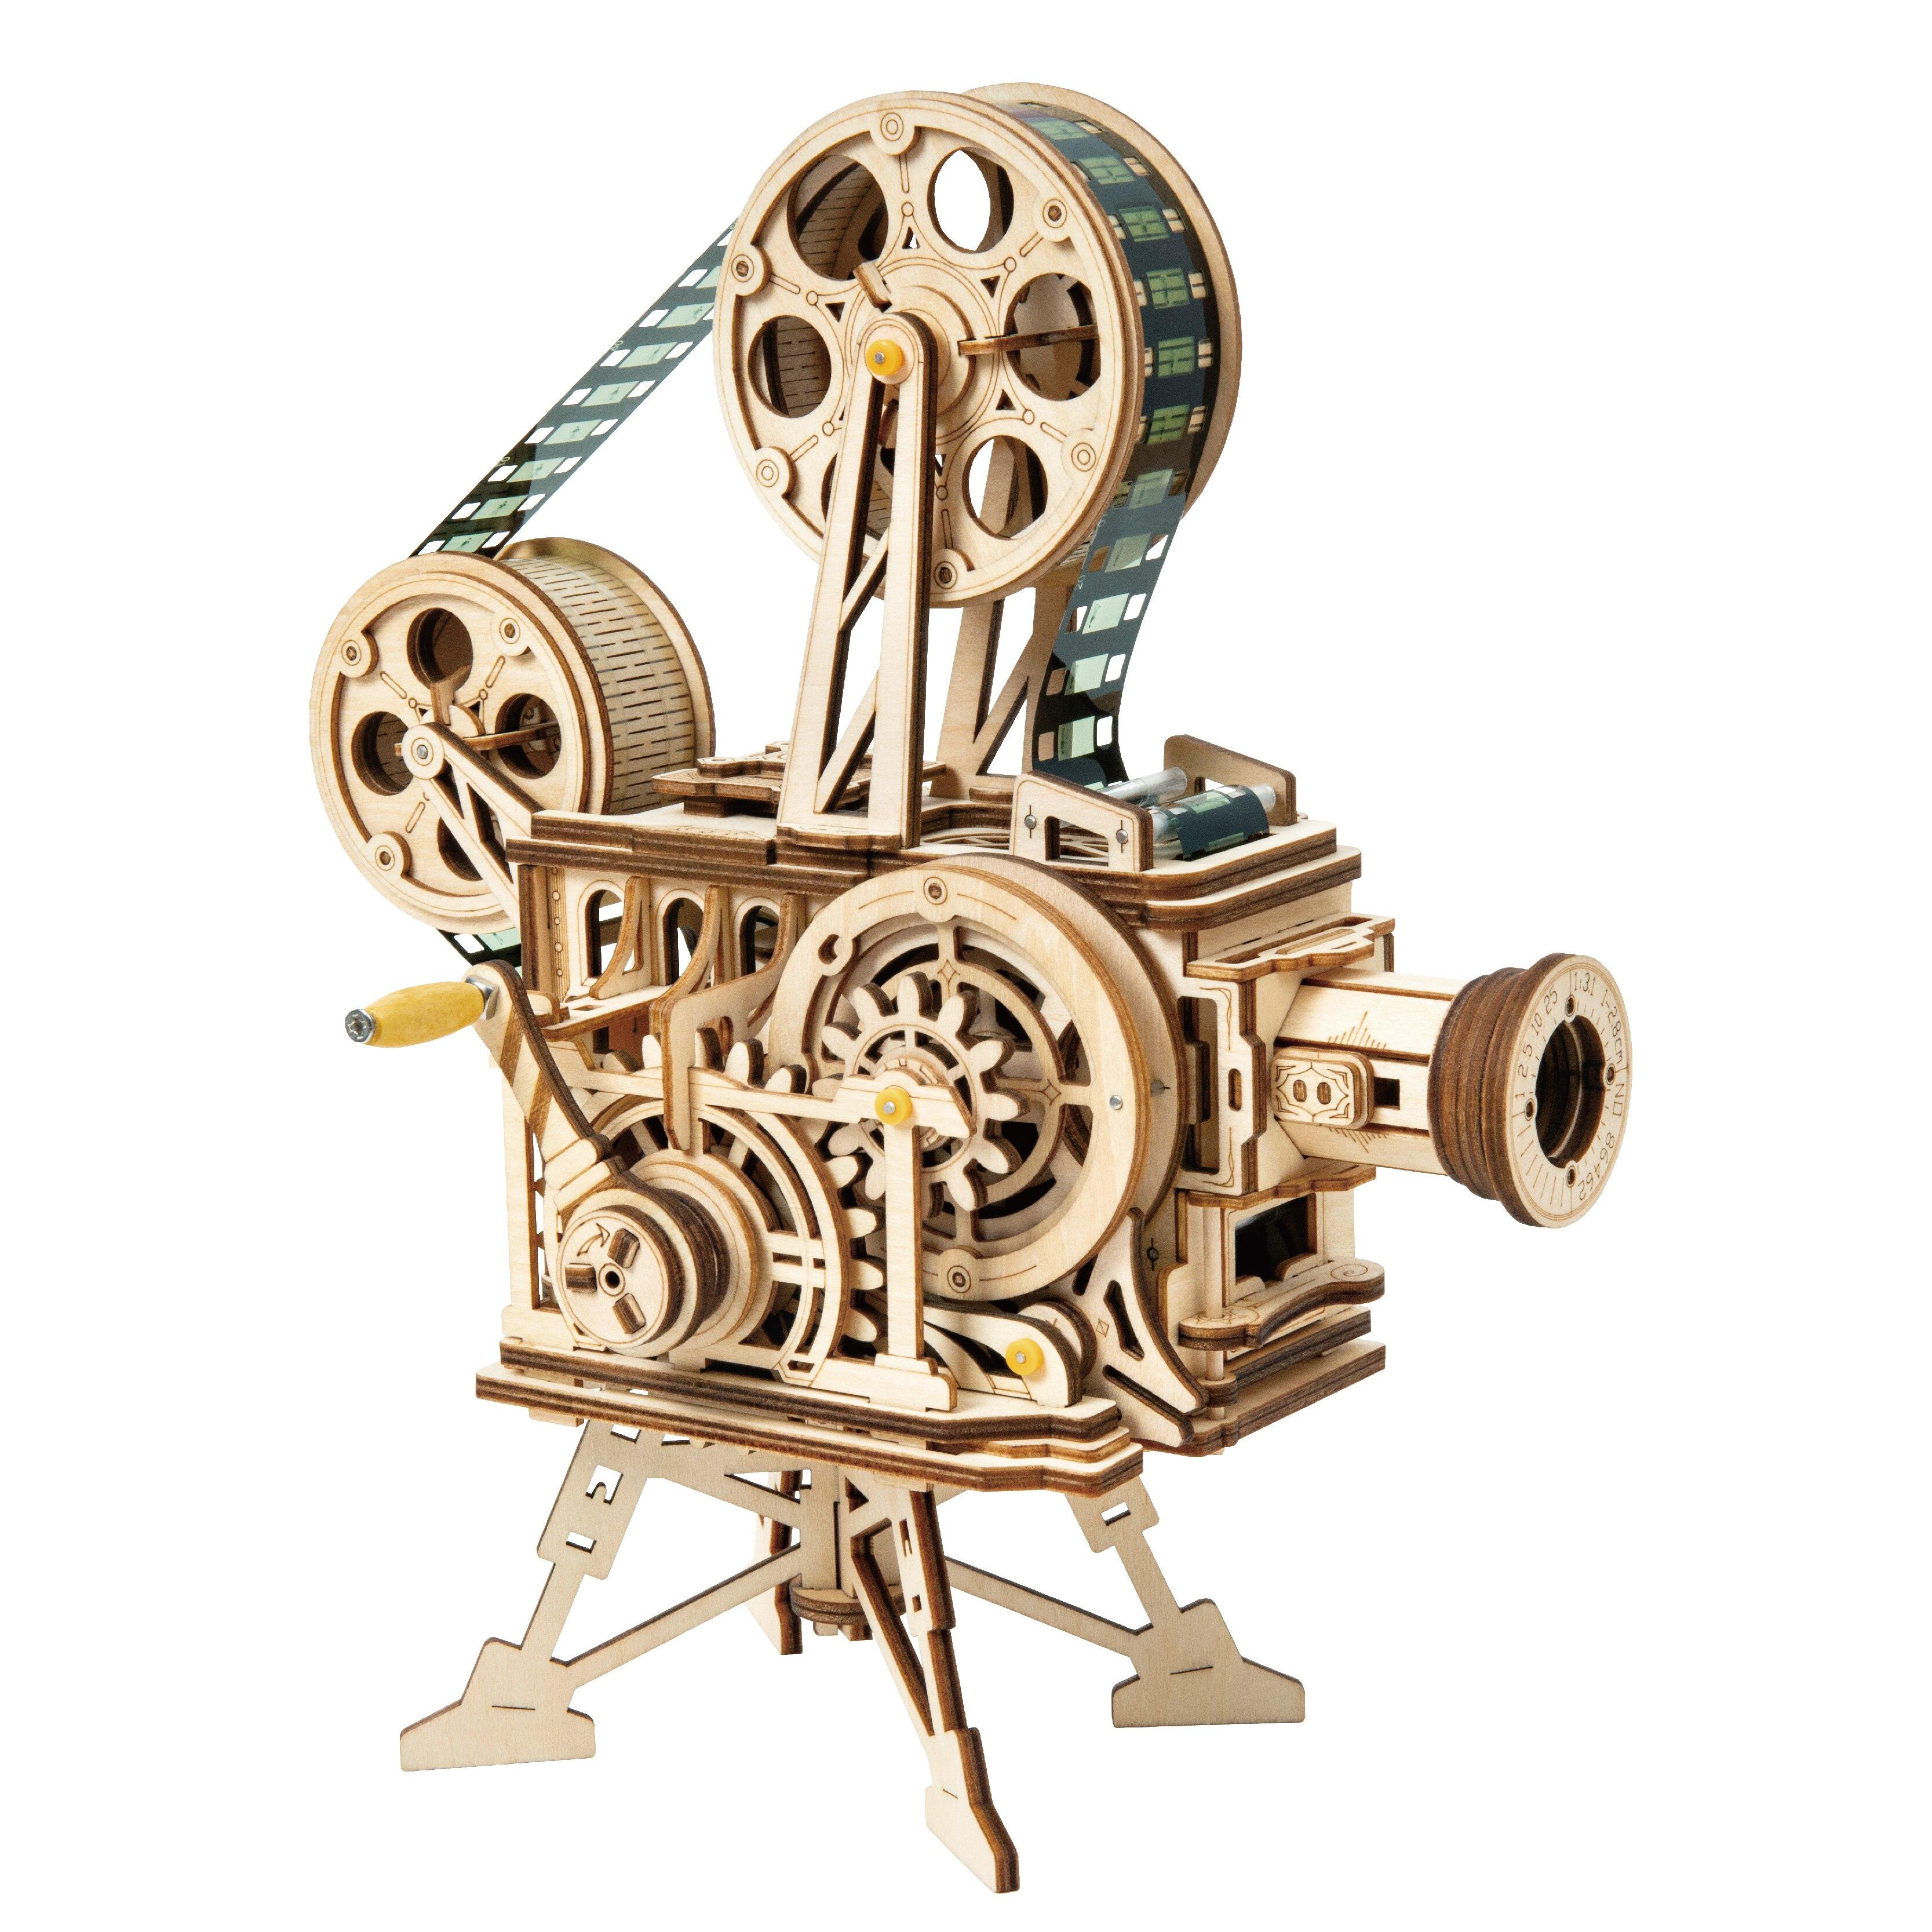 Robotime New DIY Model Building Kits Mechanical Model 3D Wooden Puzzle Film Projector Treasure Train Toys For Children LG/LK/AM